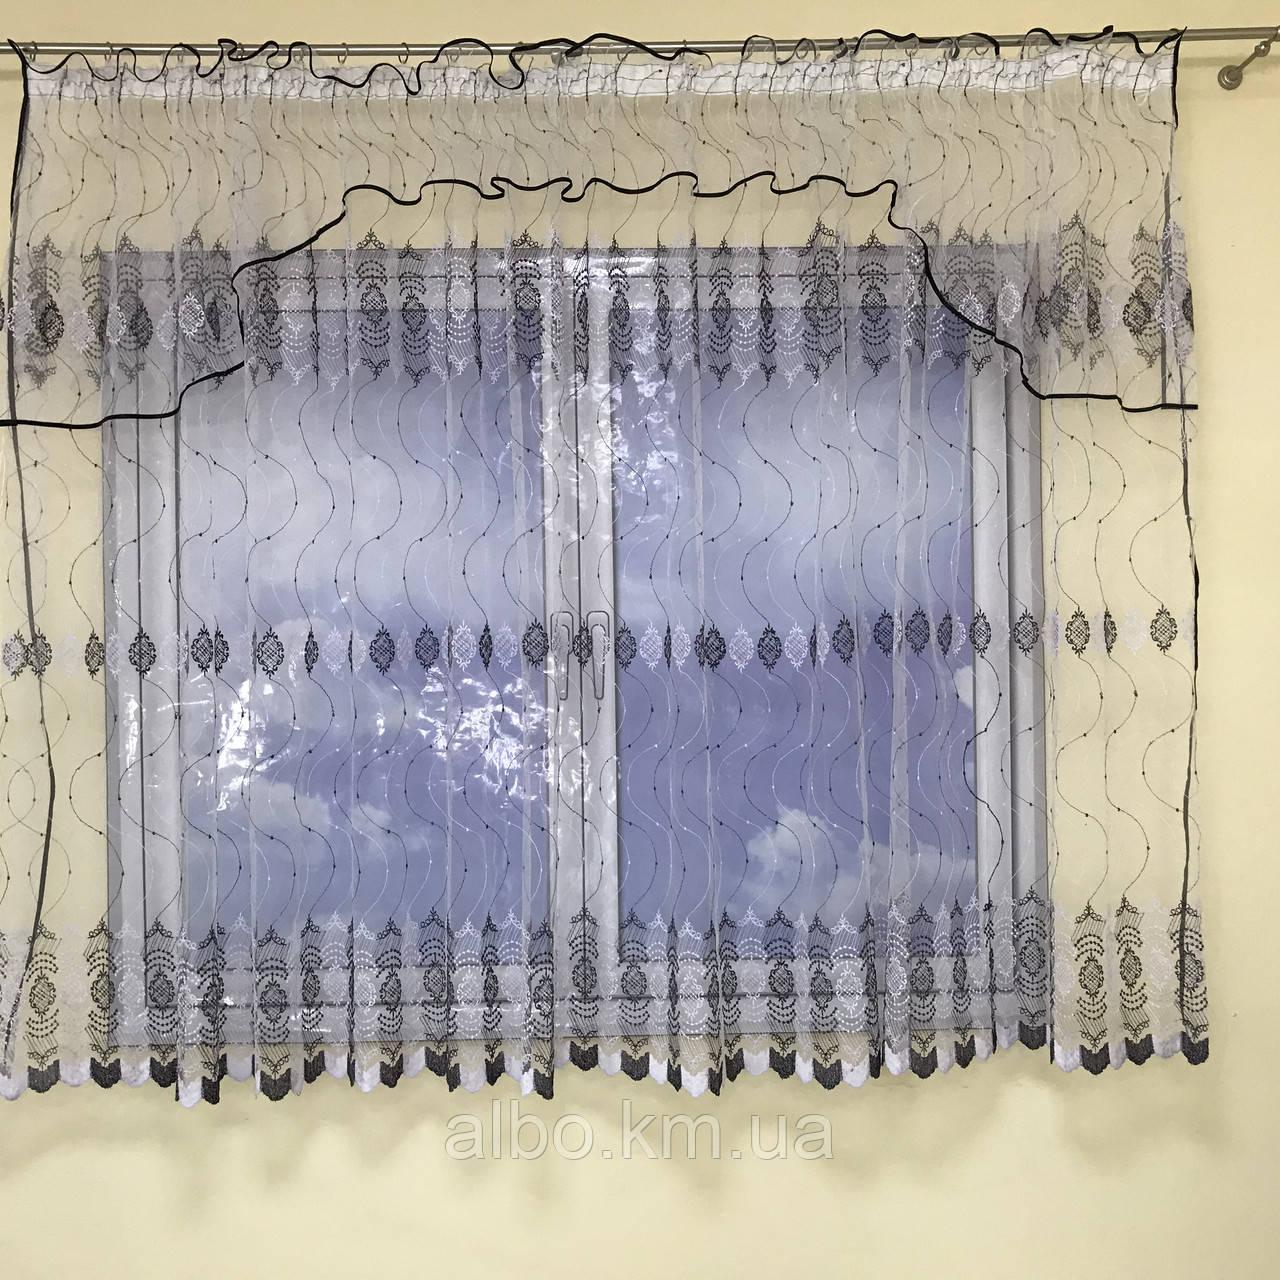 Короткая тюль в зал из турецкого фатина ALBO 400x180 cm Бело-черная (KU-140-14)